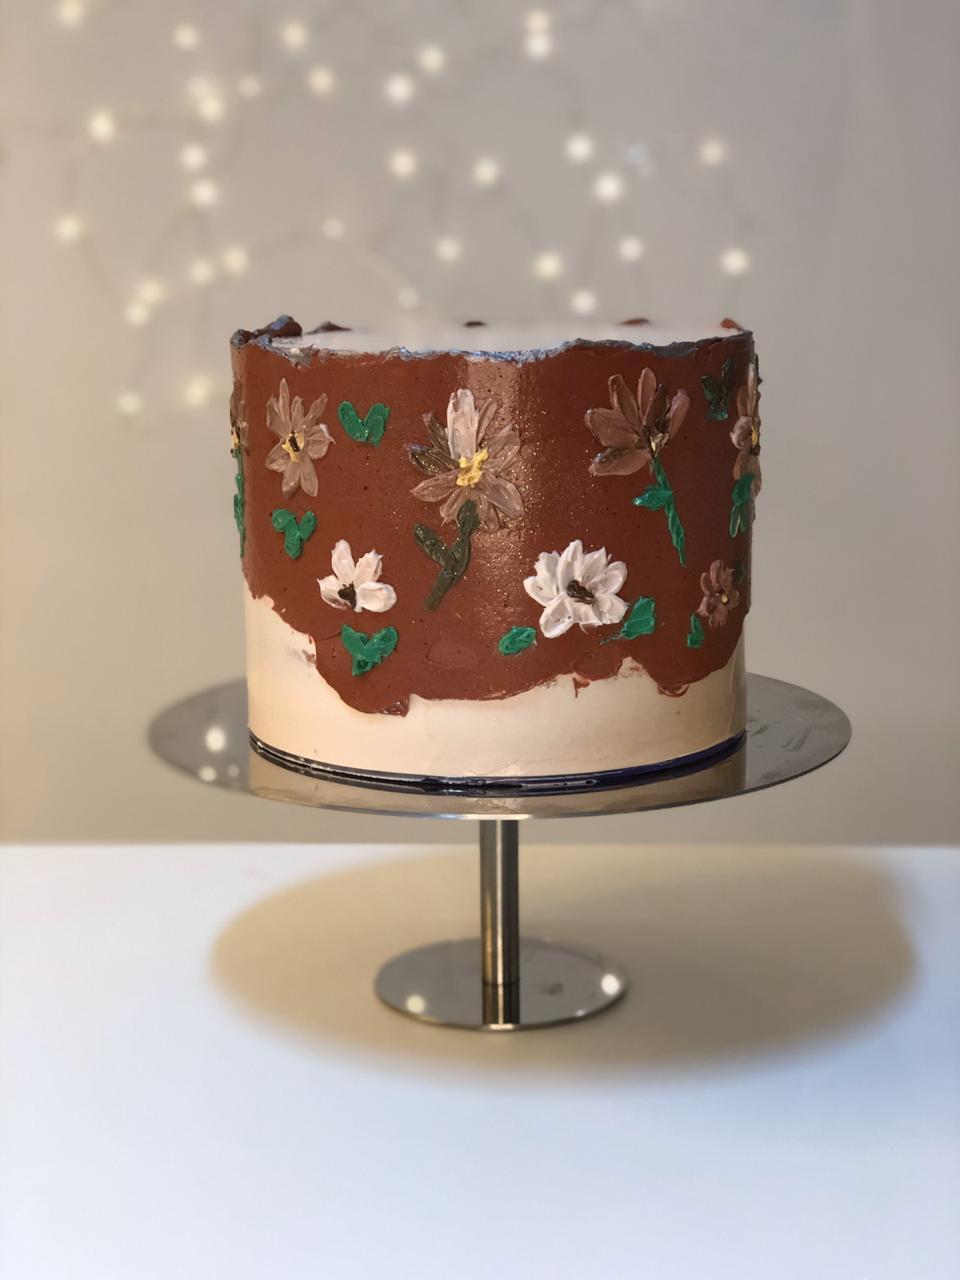 Personalizados Bel Cakes